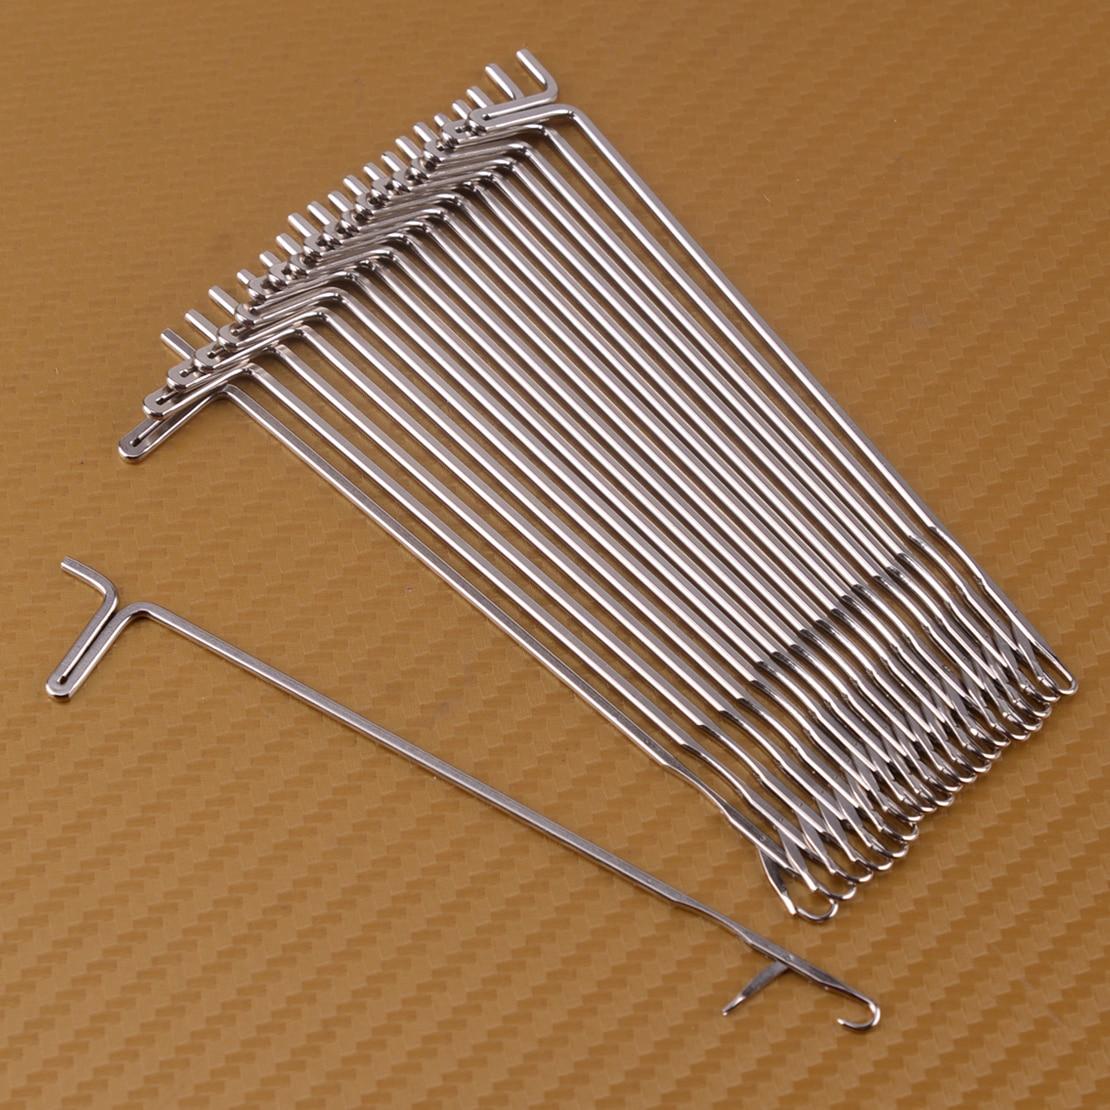 20x Needles Fit Silver Reed Singer Studio Empisal Knitmaster Knitting Machine